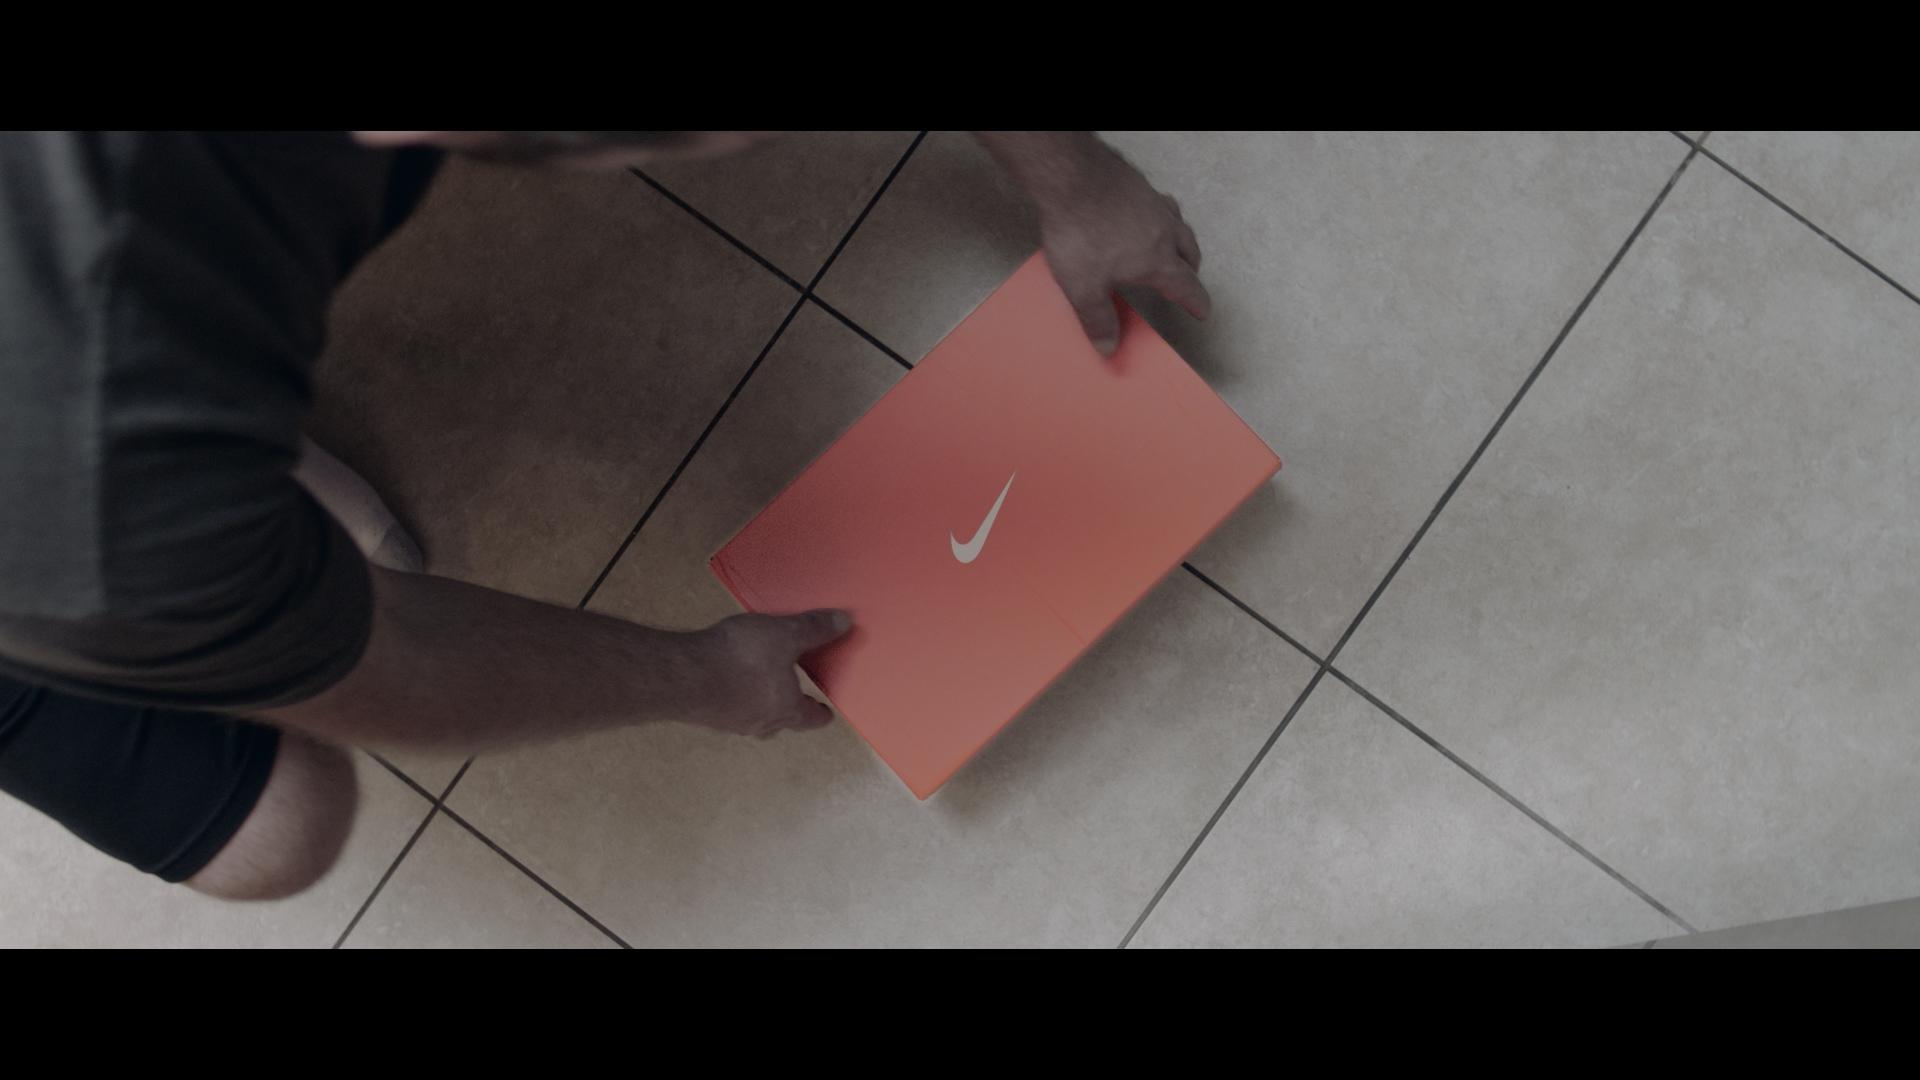 NikeSpecSTL_1.16.1.jpg